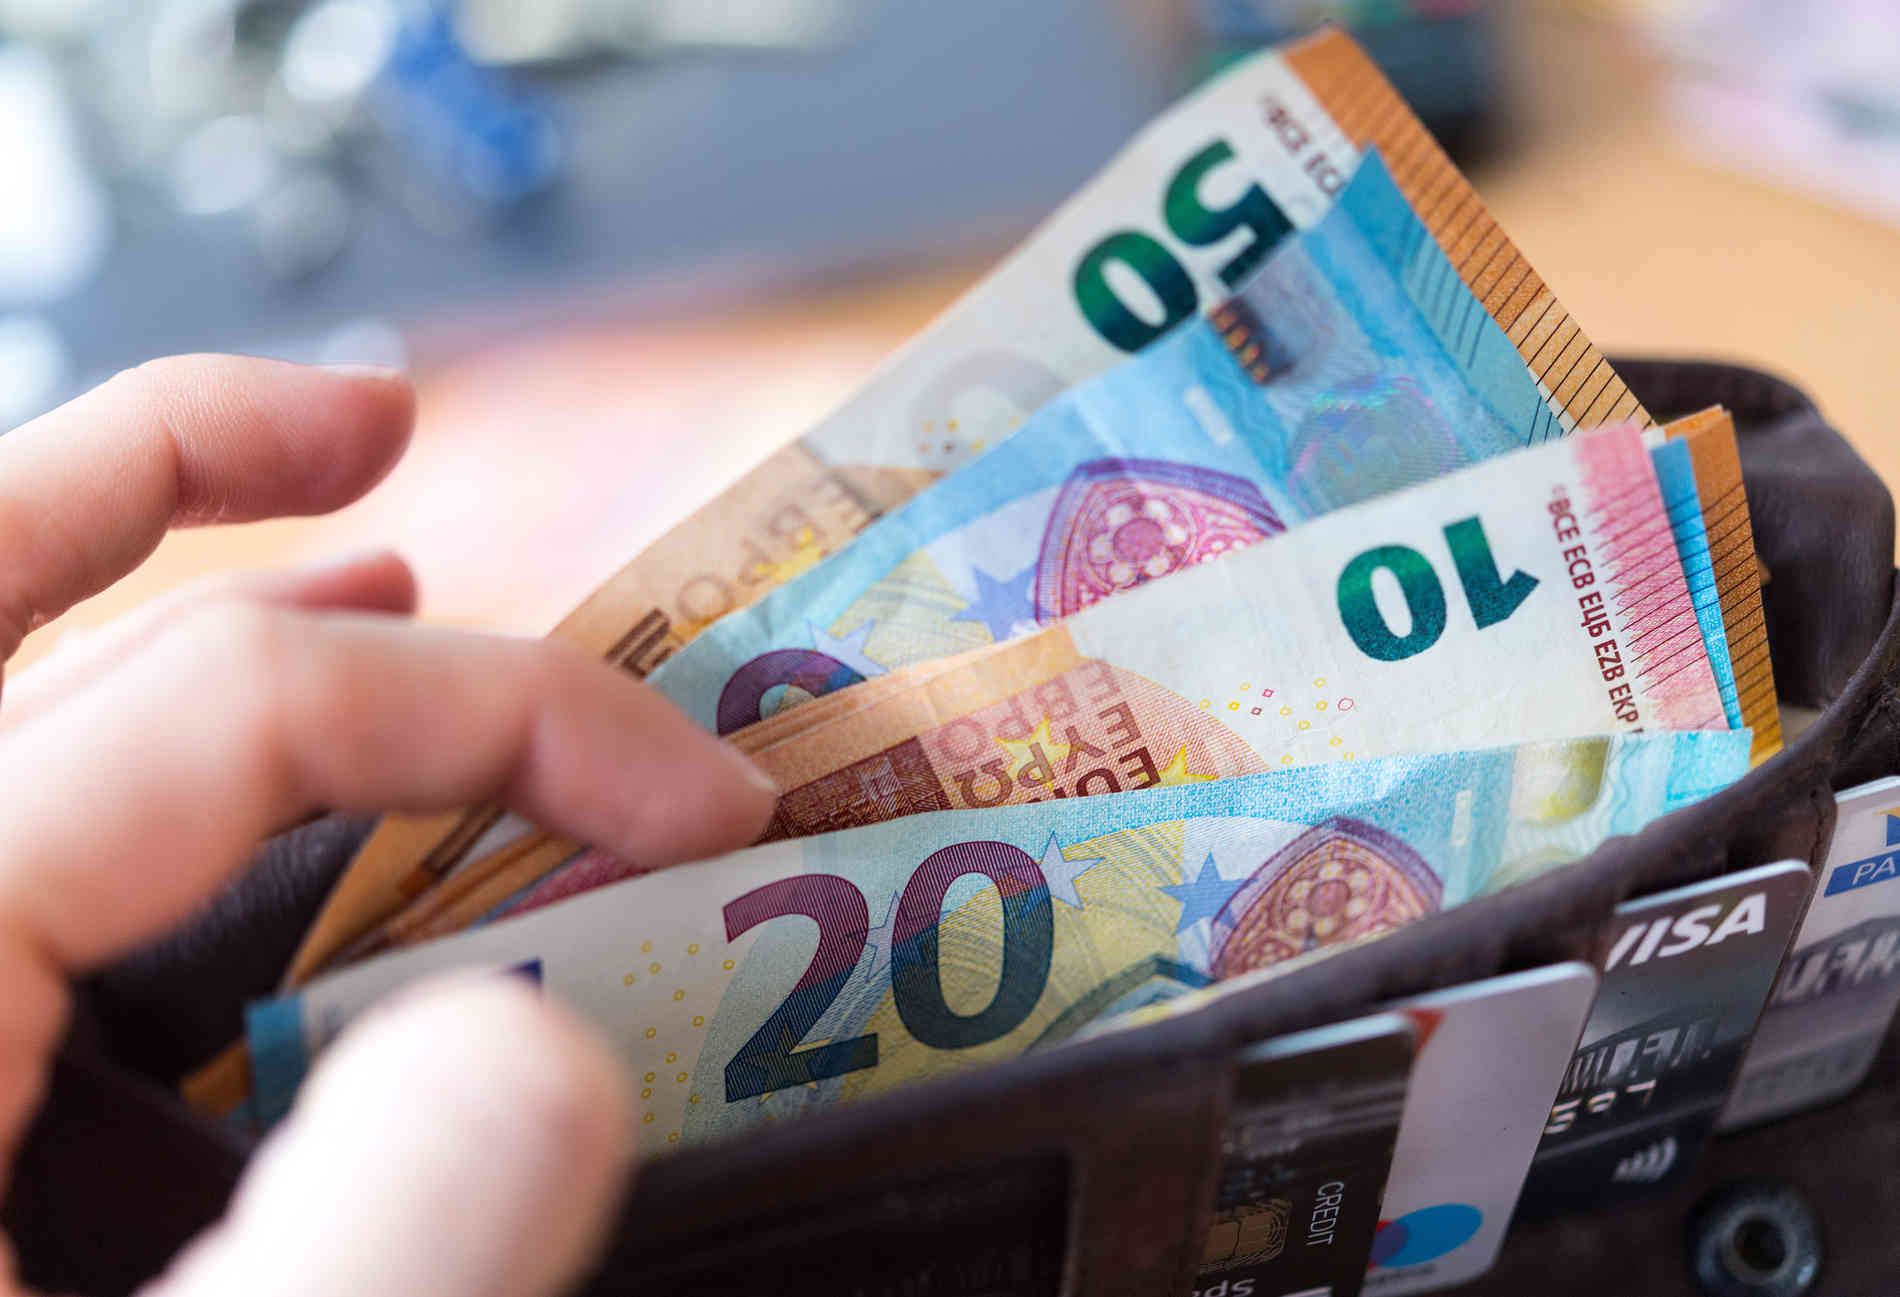 83-Jähriger vergaß 10.000 Euro auf Autobahntoilette